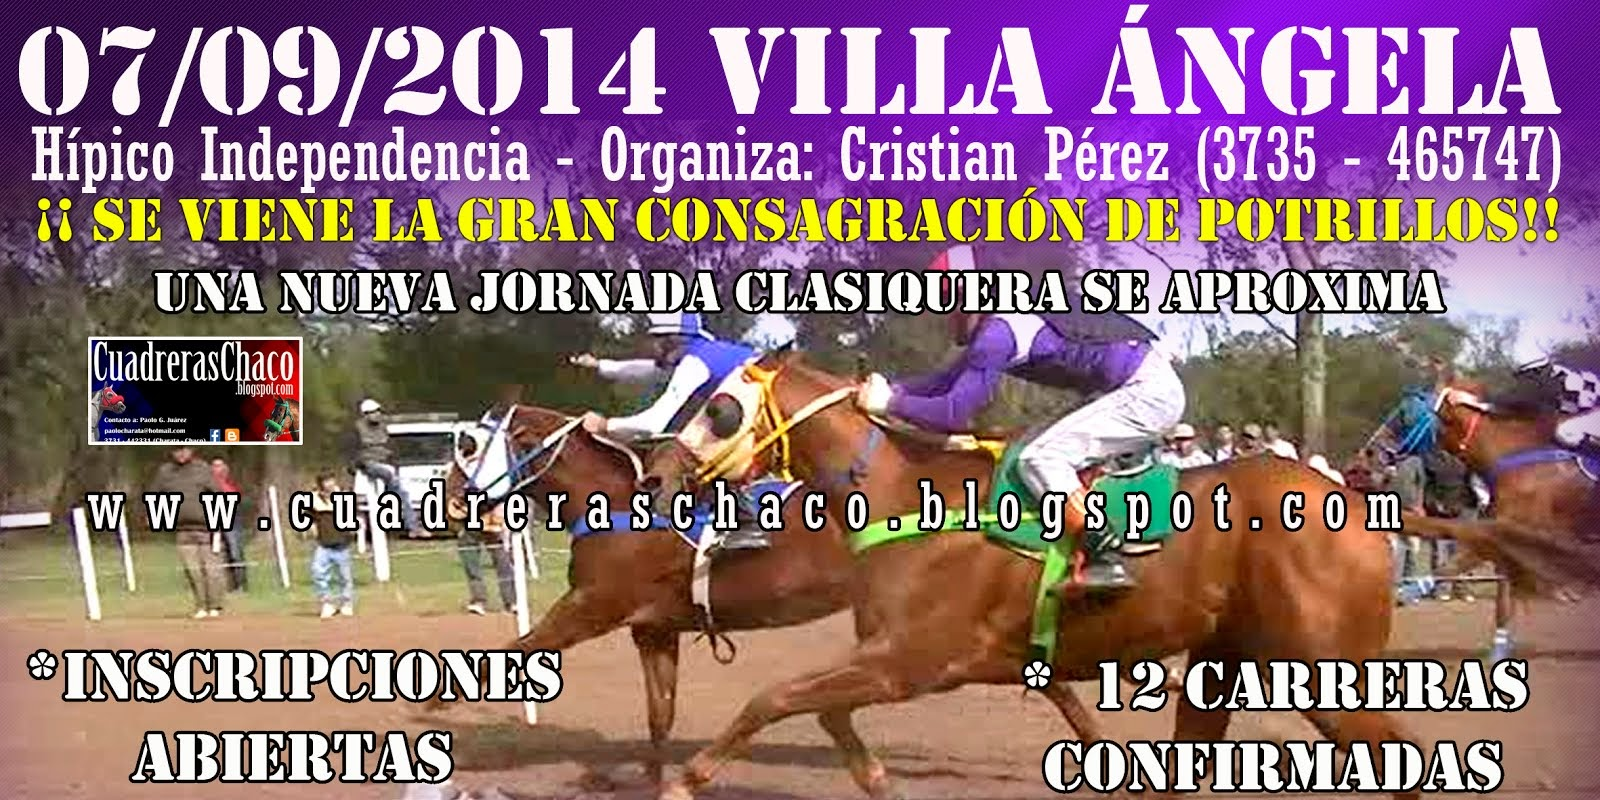 VILLA ANGELA 7-9